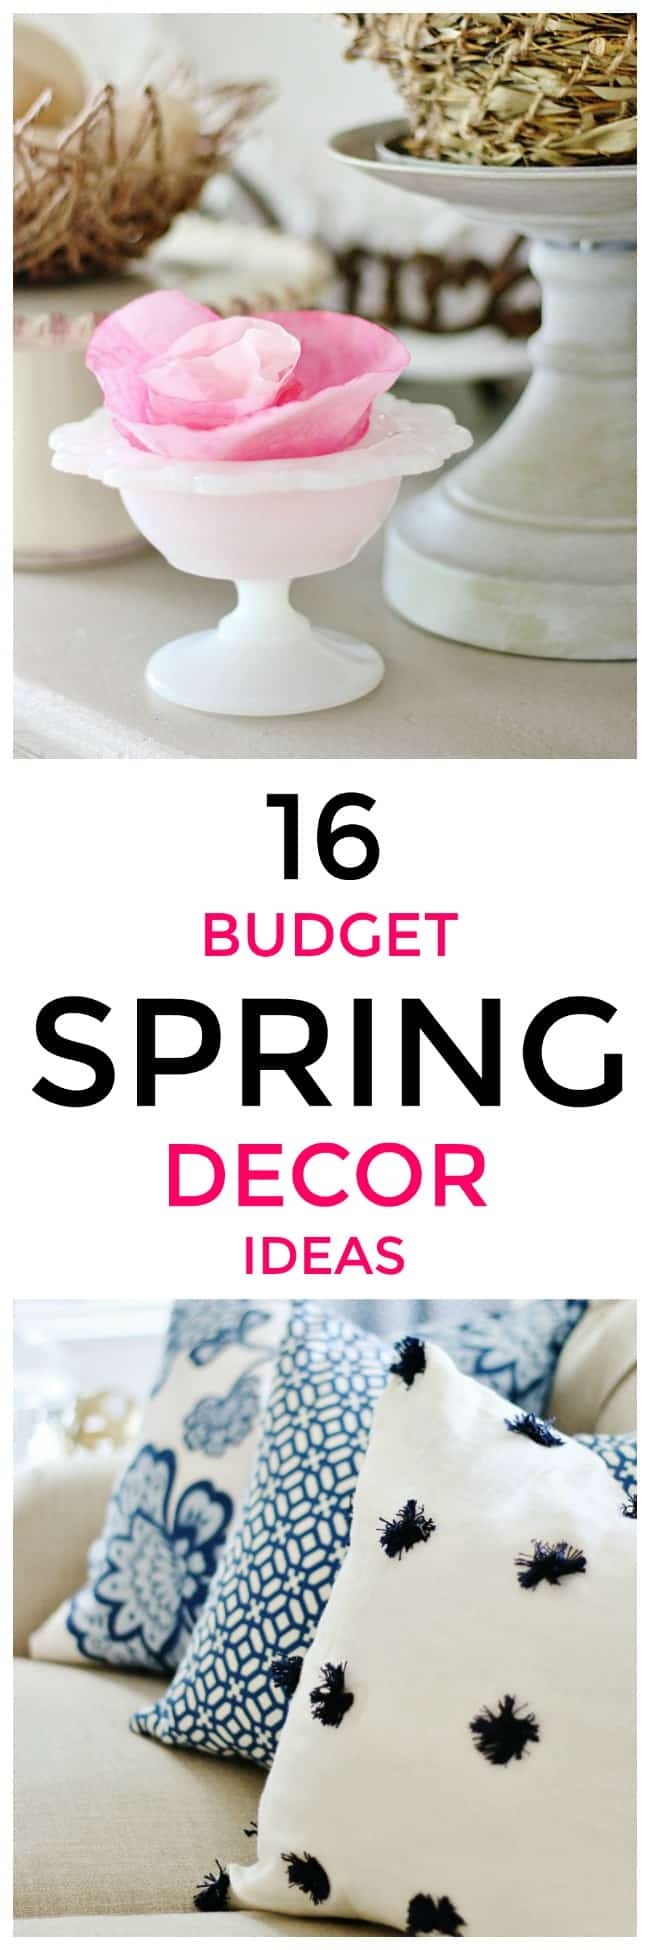 16 Budget Spring Decor Ideas Thistlewood Farm